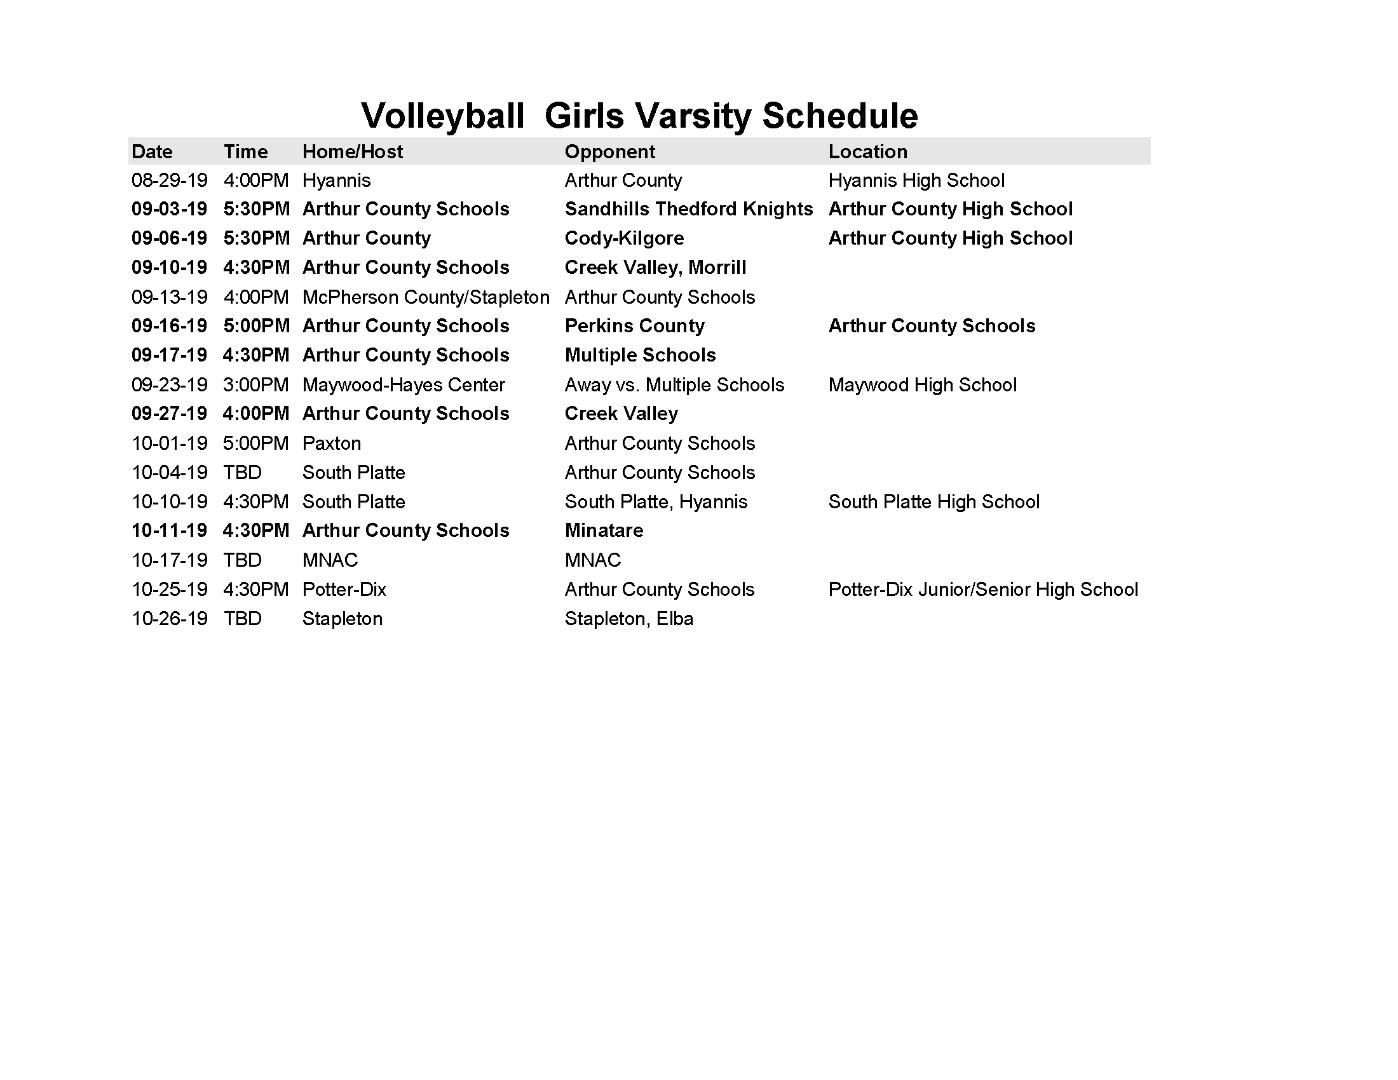 Arthur County Schools - Arthur County Varsity Volleyball